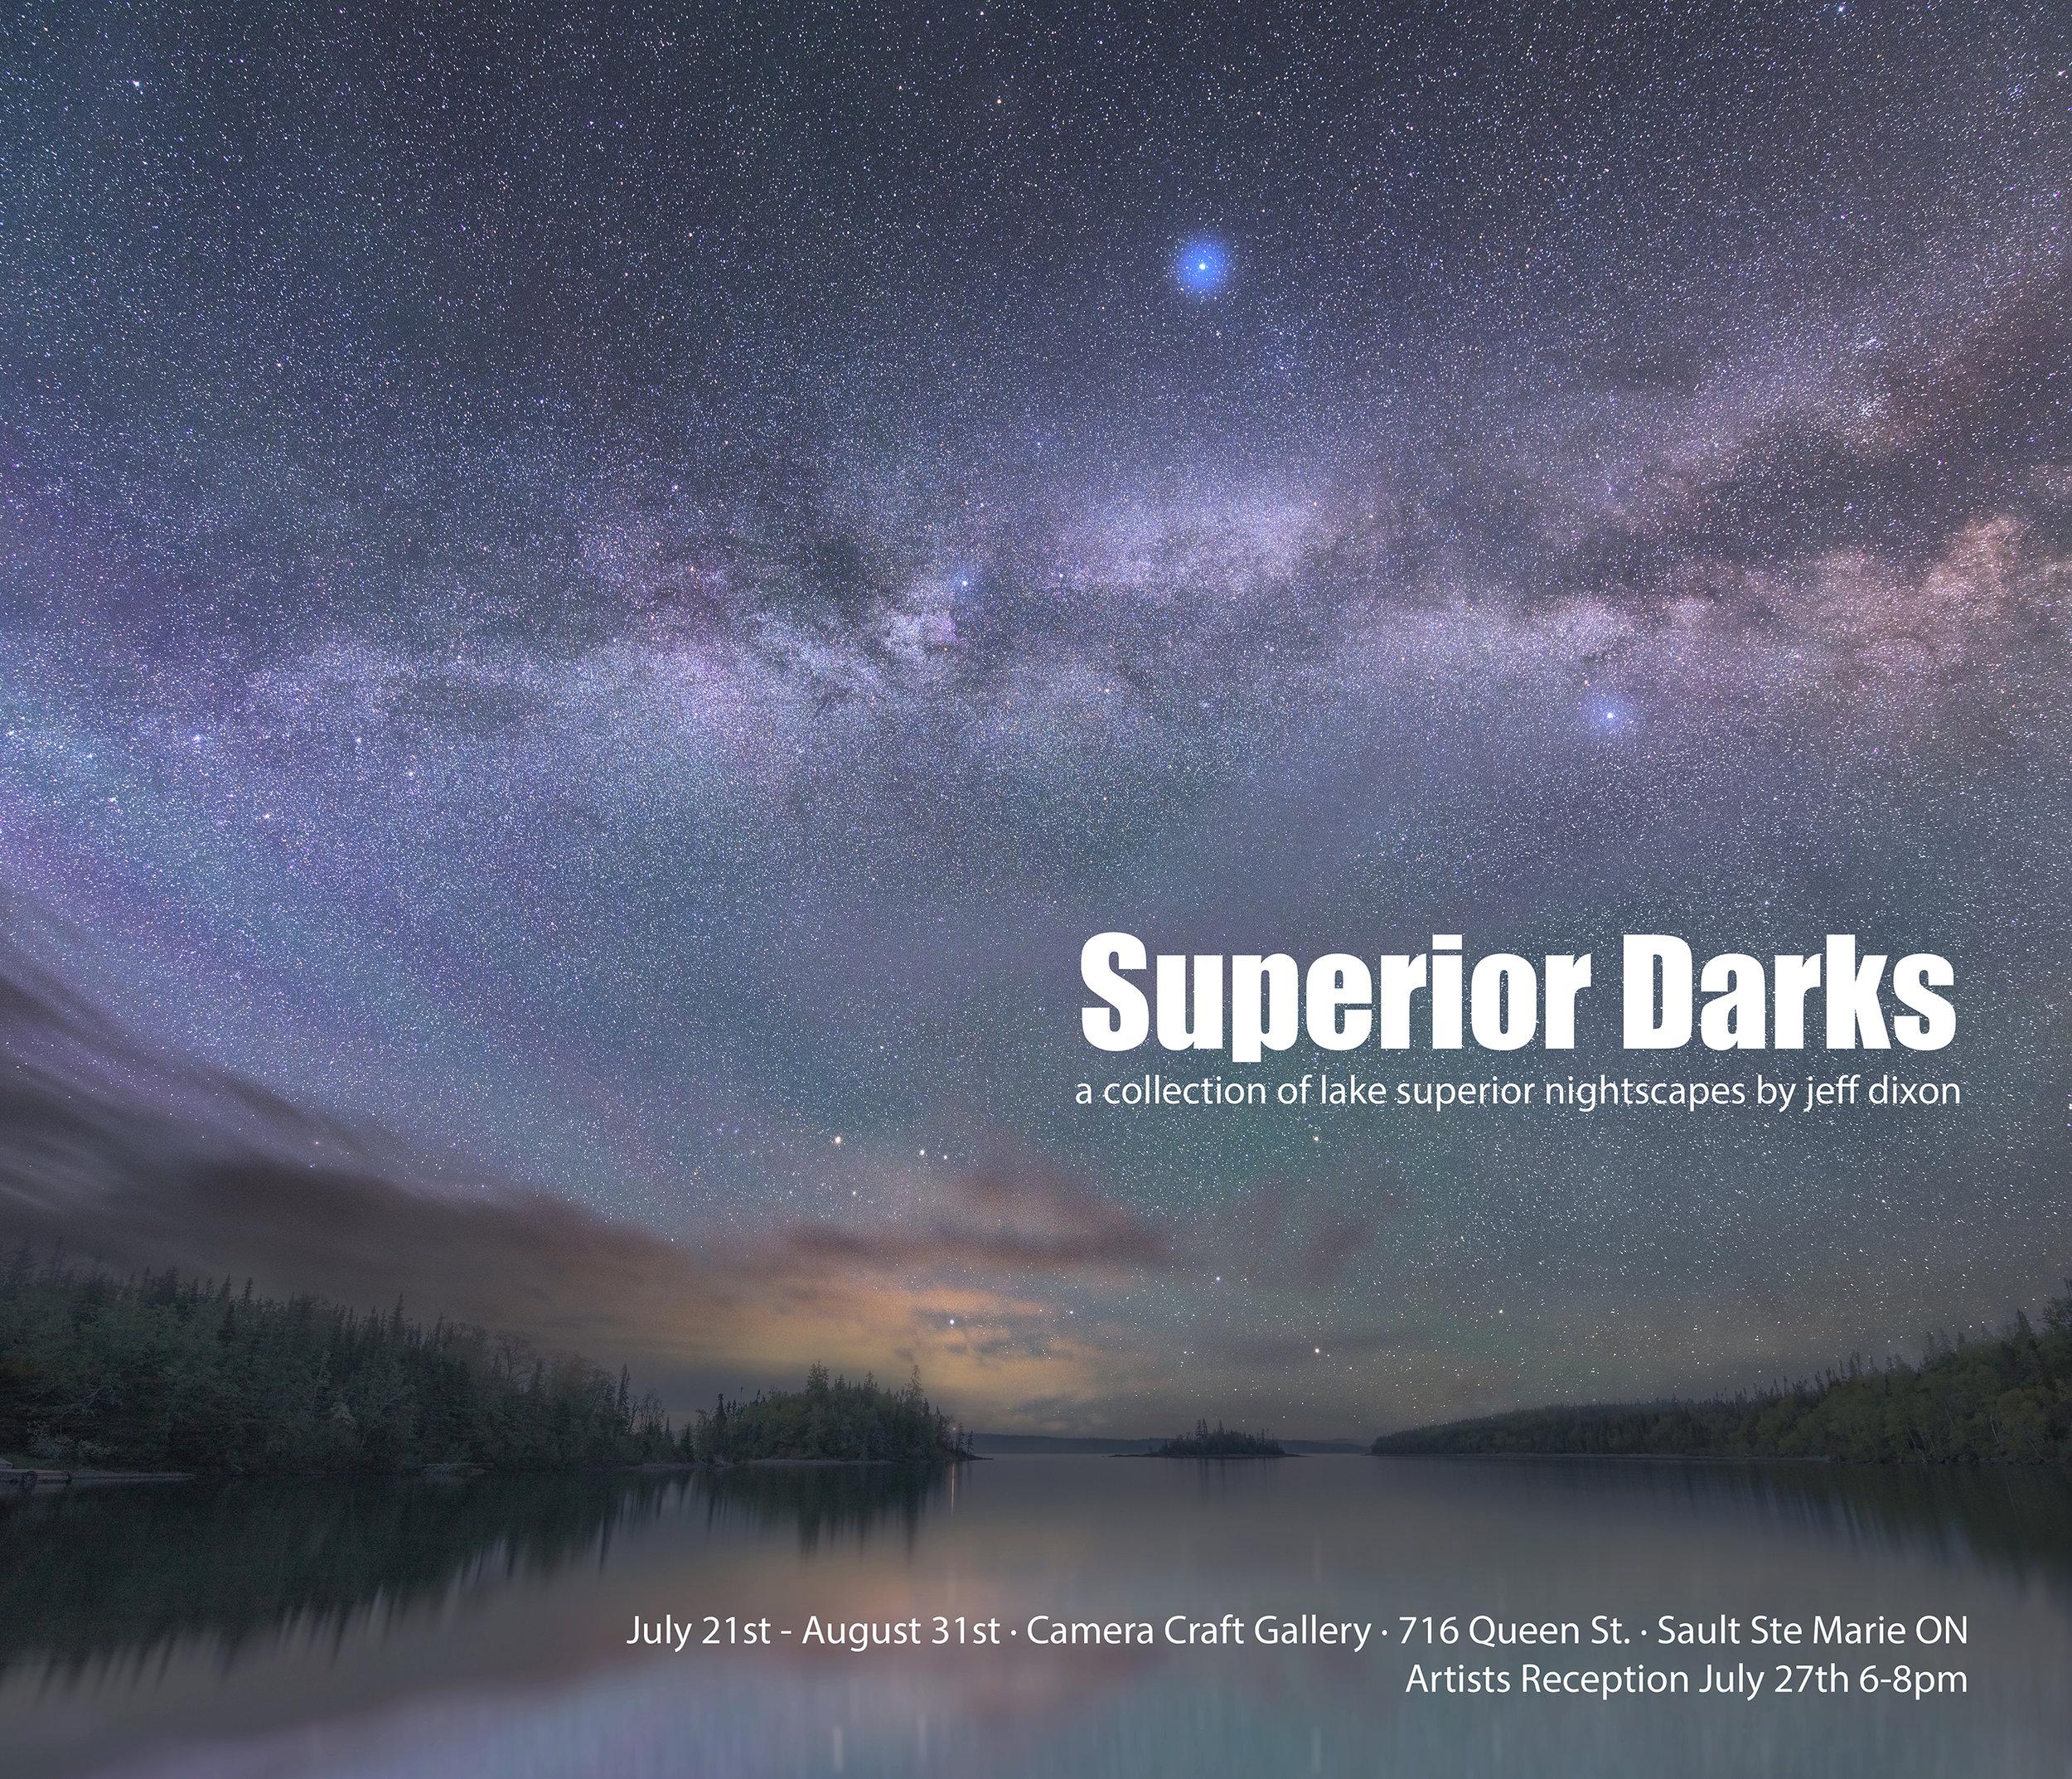 superior_darks_poster-printable8x9.jpg